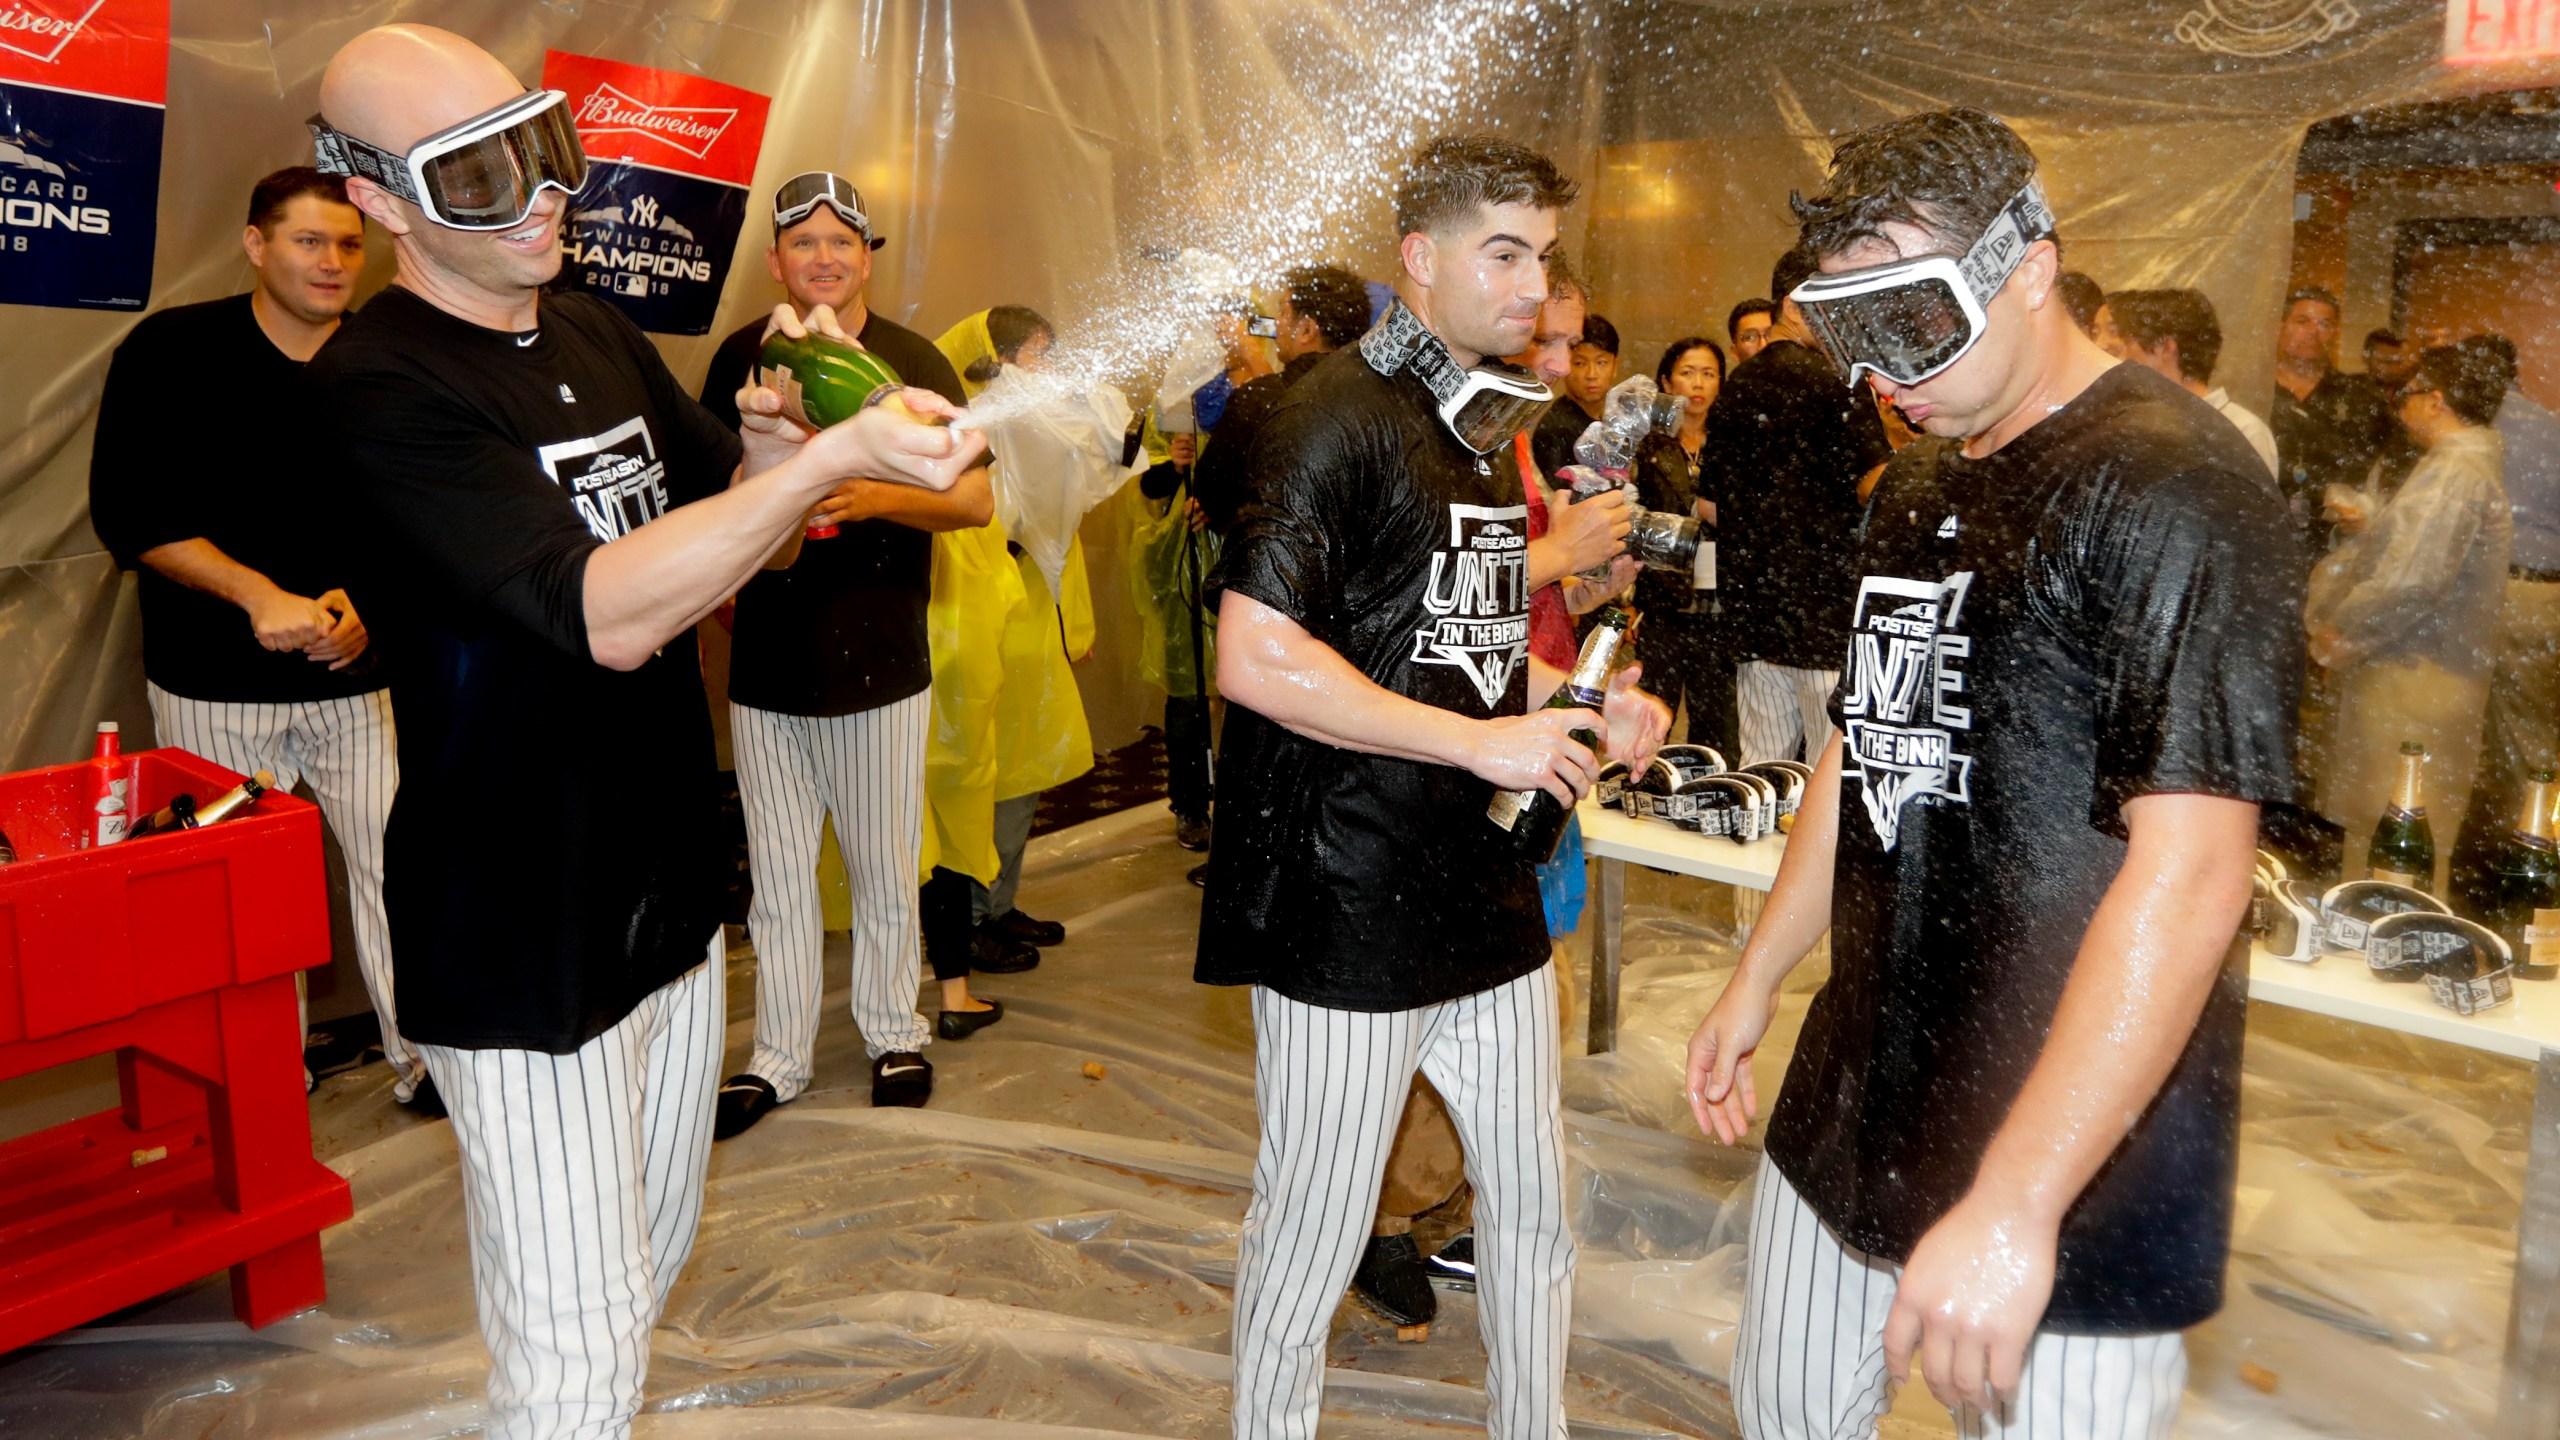 Athletics_Yankees_Baseball_10848-159532.jpg04395293